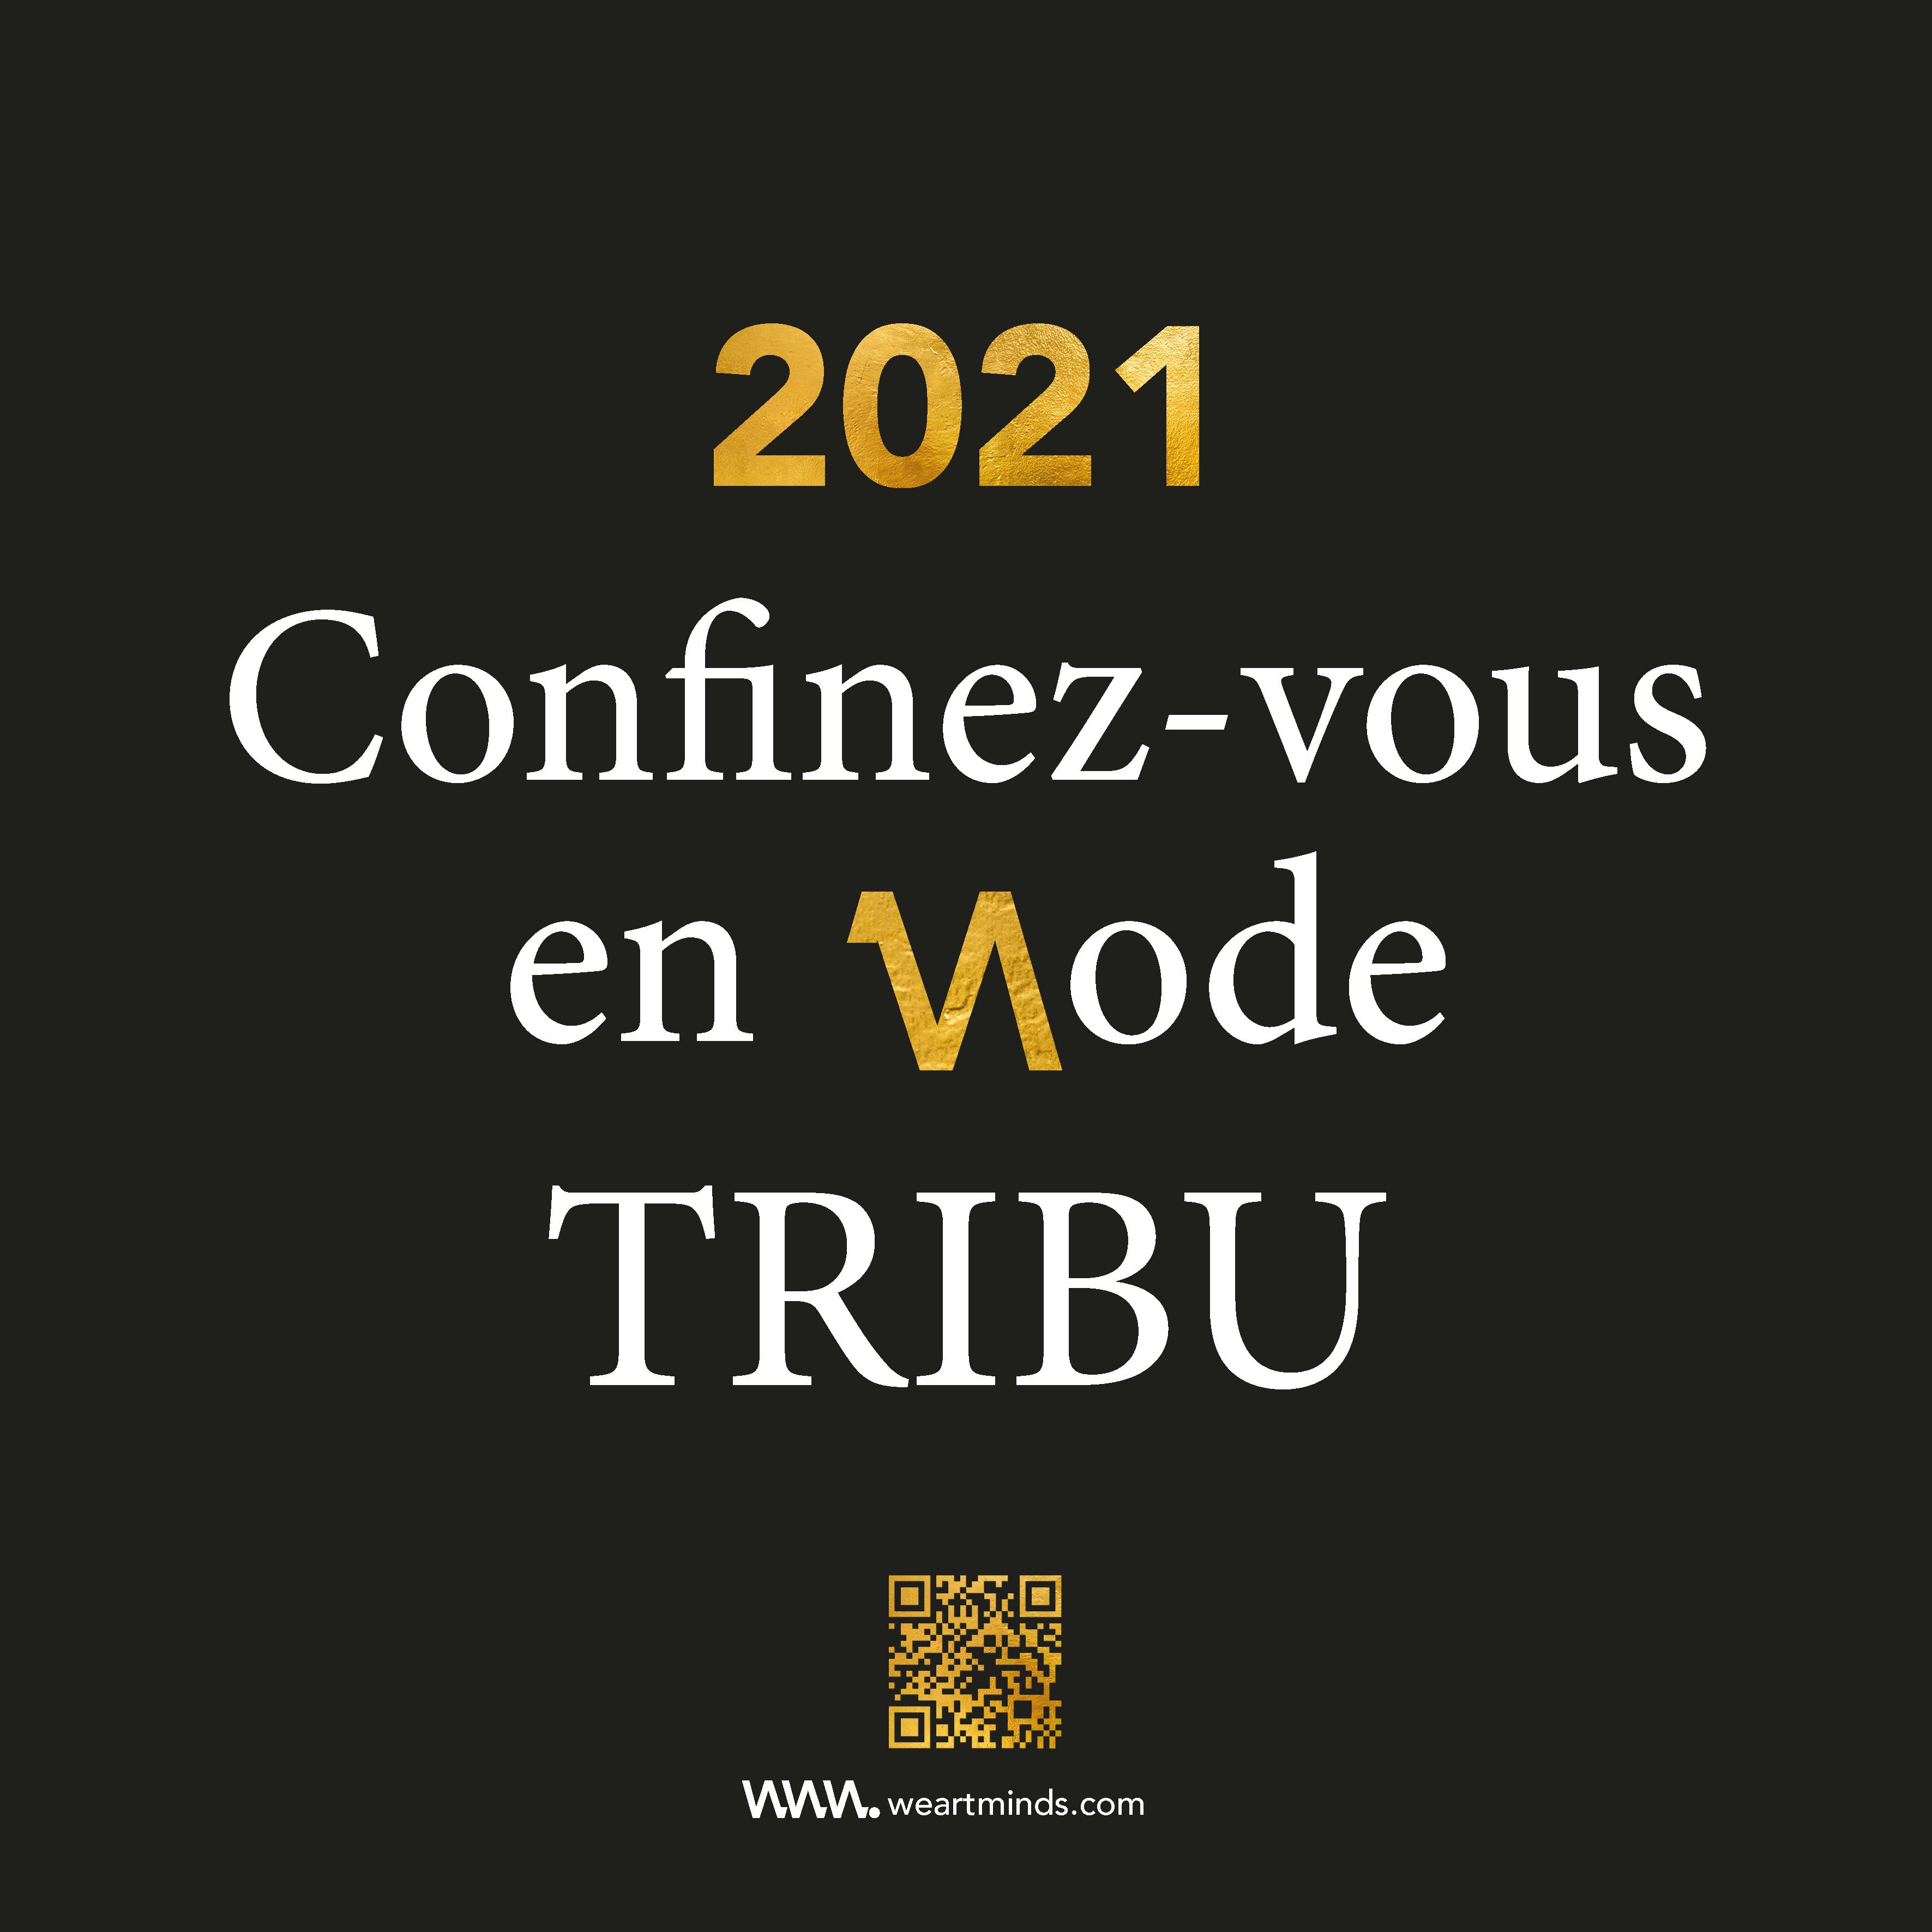 carte7 WAM 1220